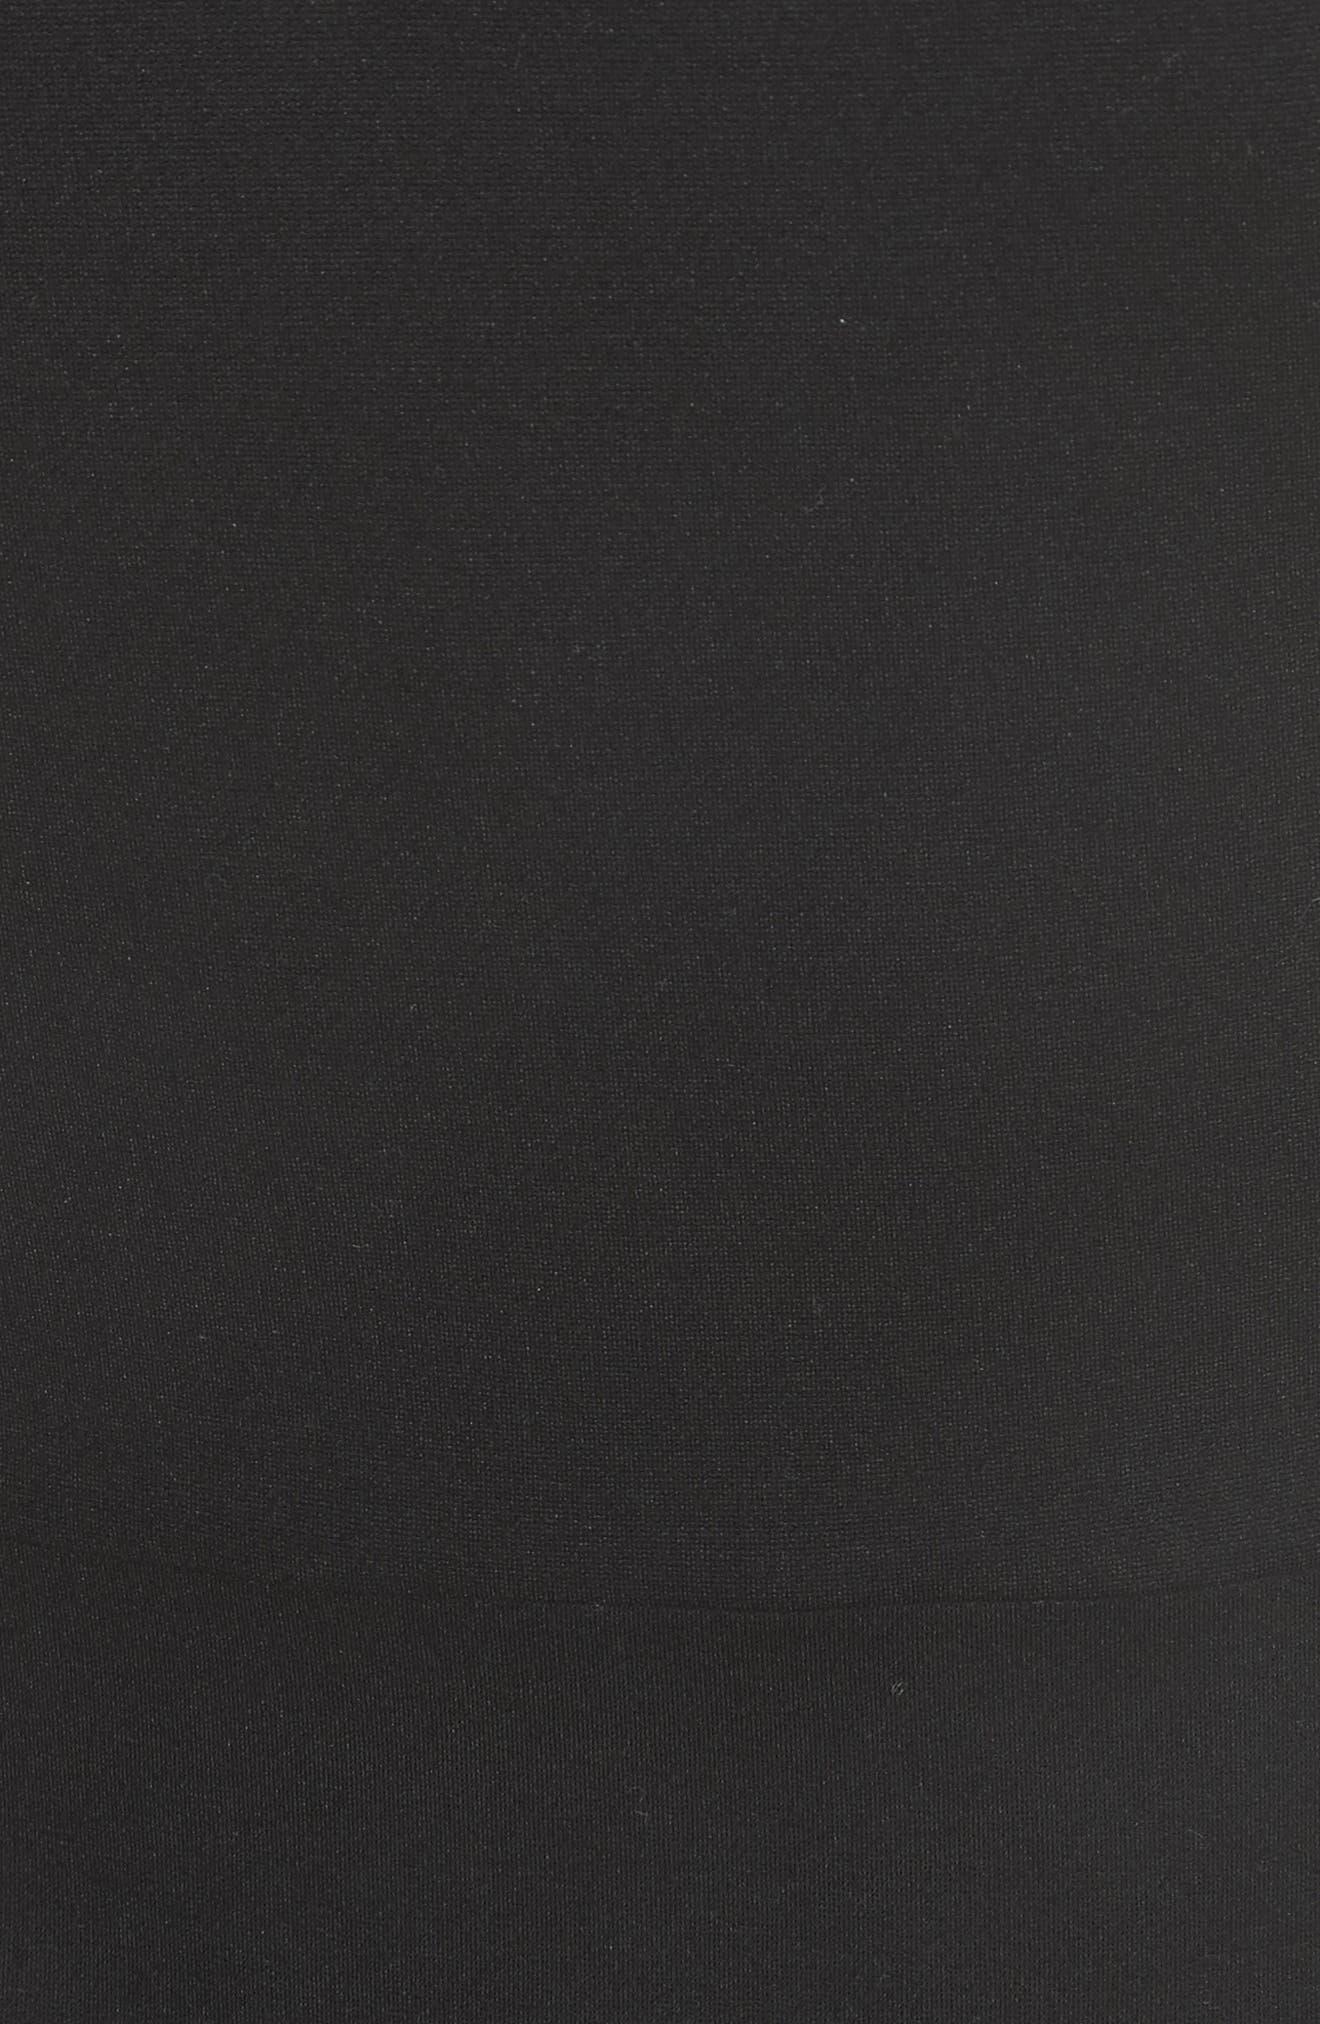 fluttter sleeve ponte knit dress,                             Alternate thumbnail 5, color,                             Black